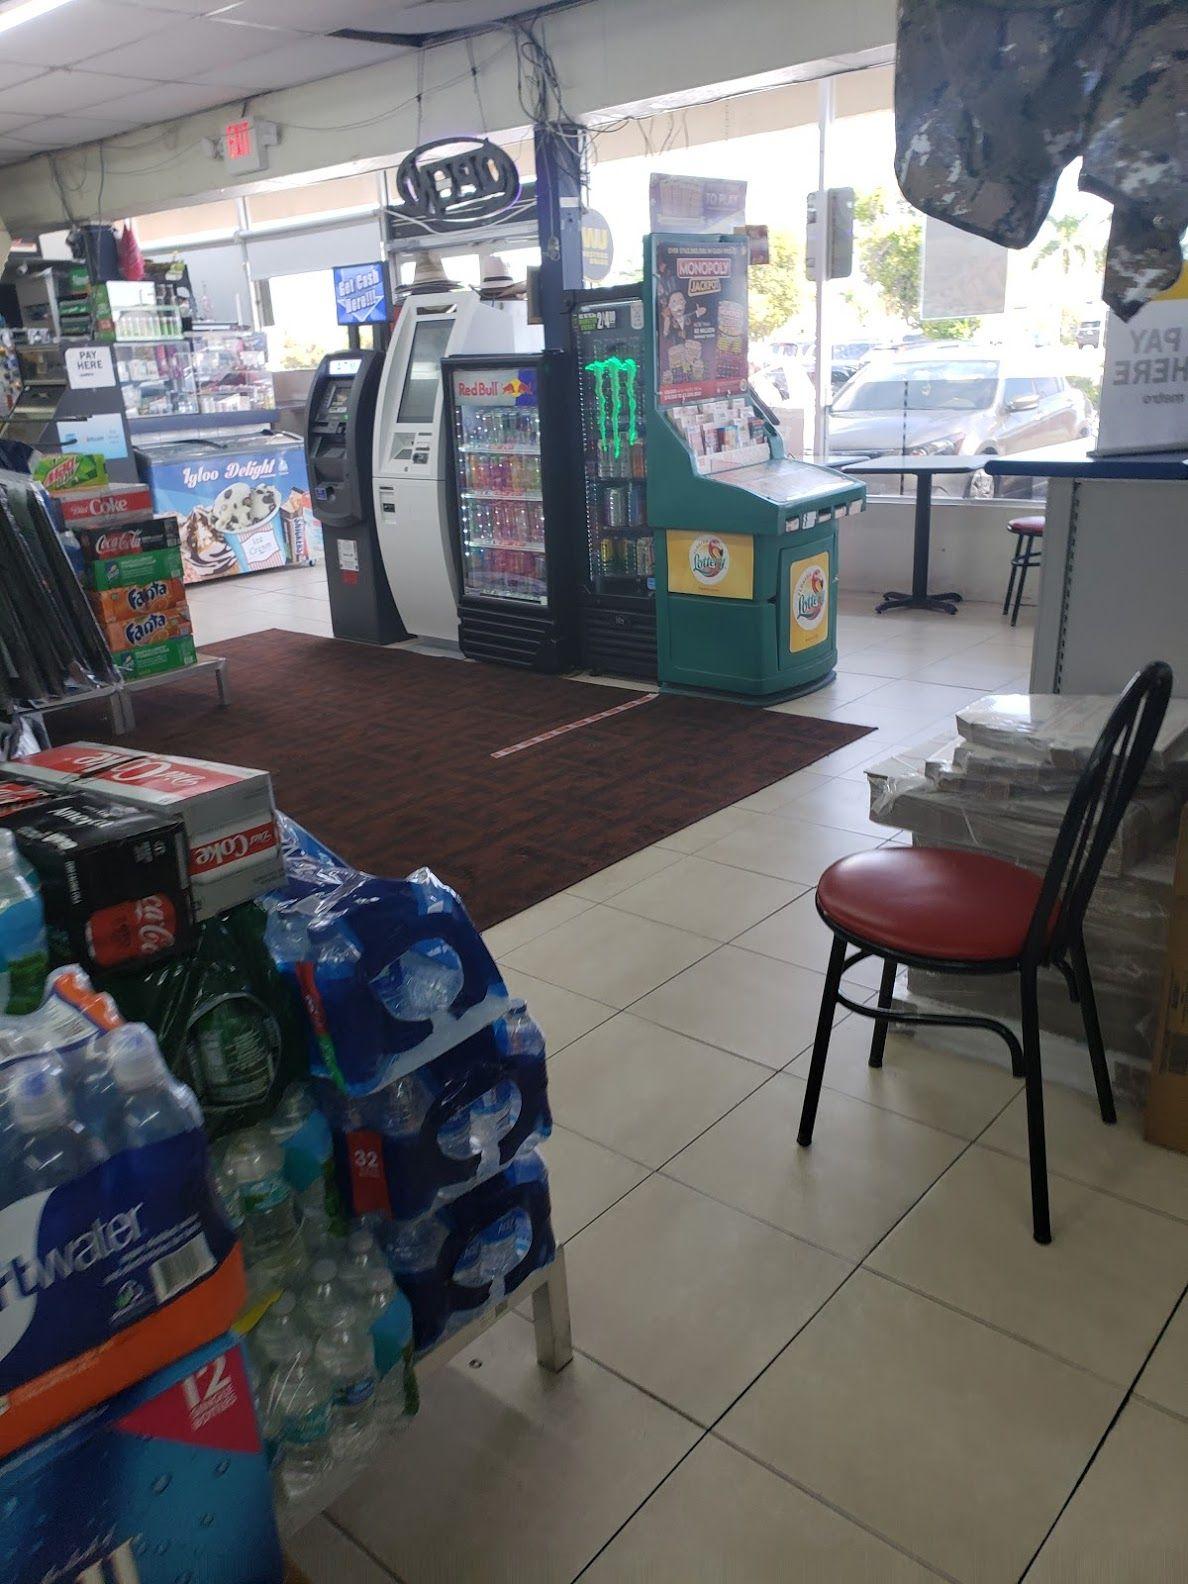 B Kwik Food Store - Coinsource 2